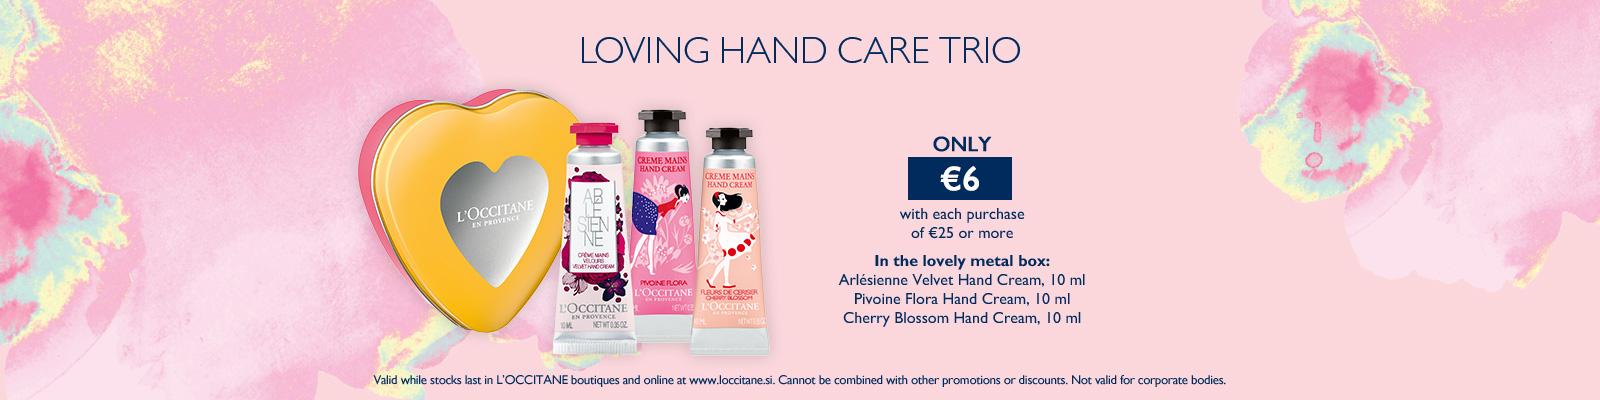 Loving hand care trio